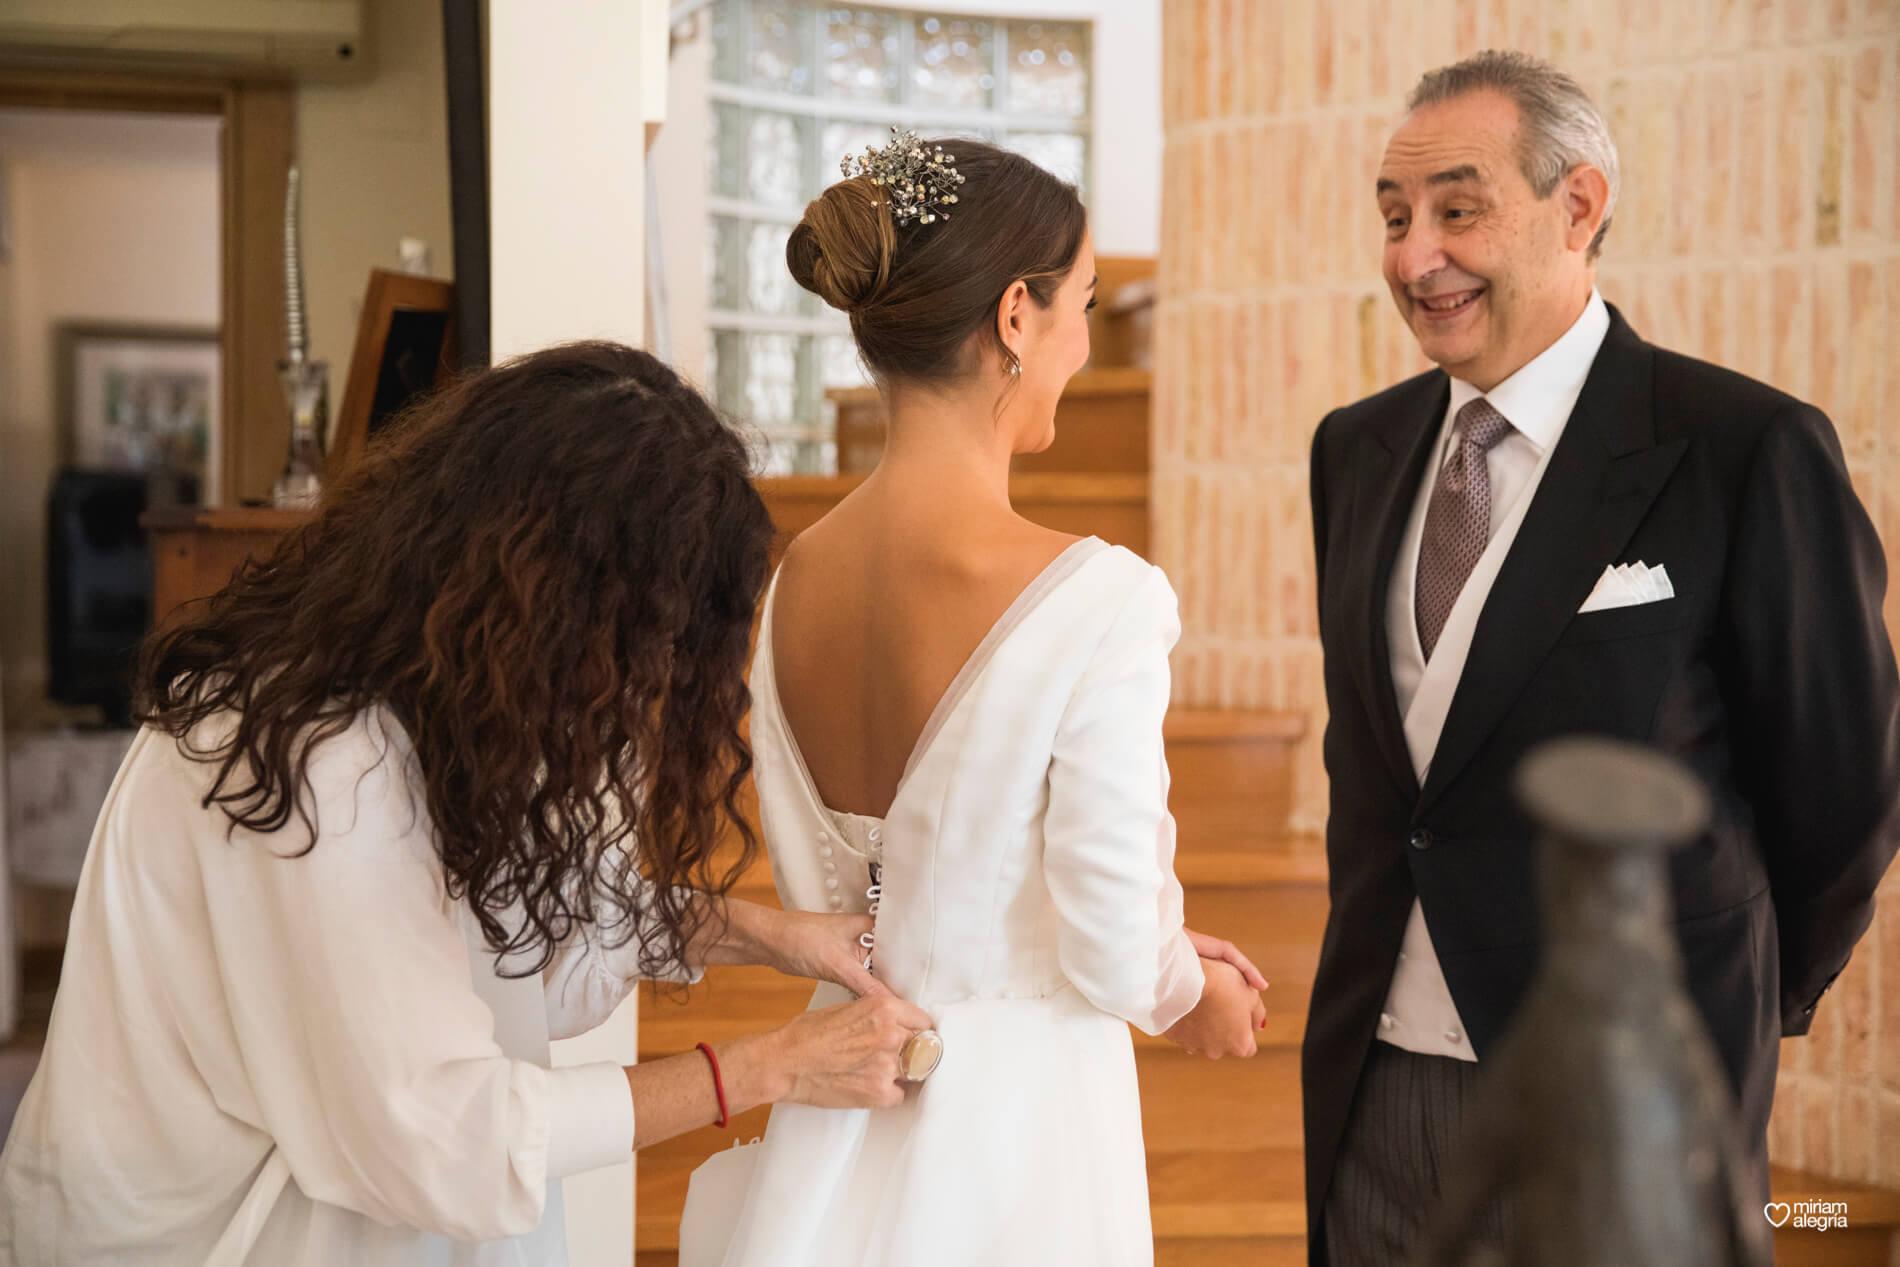 vestido-de-novia-paula-del-vas-miriam-alegria-fotografos-boda-murcia-30